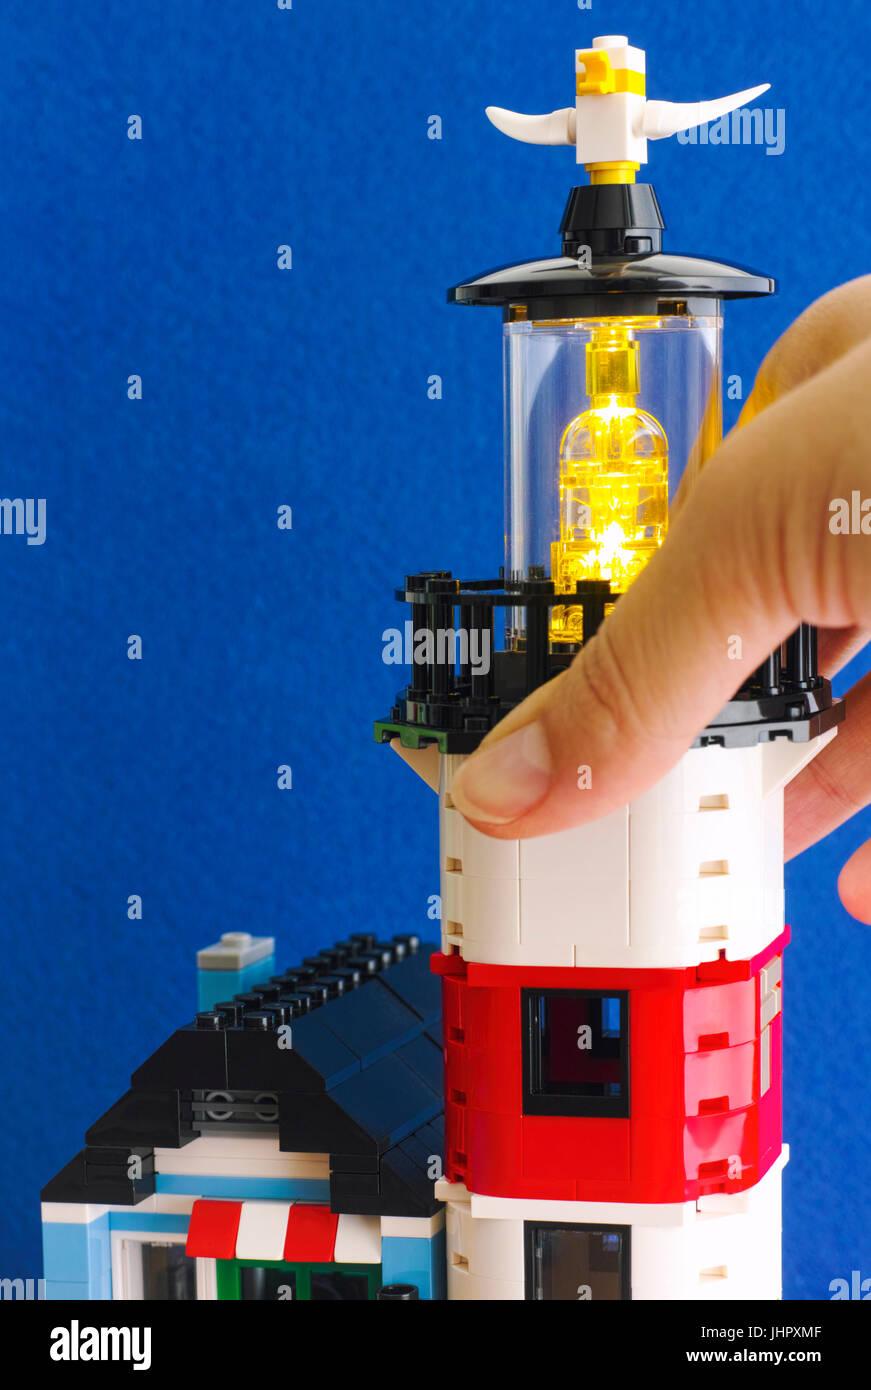 Tambov, Russian Federation - June 15, 2017 Woman hand turns on Lego Lighthouse light. Blue background. Studio shot. - Stock Image